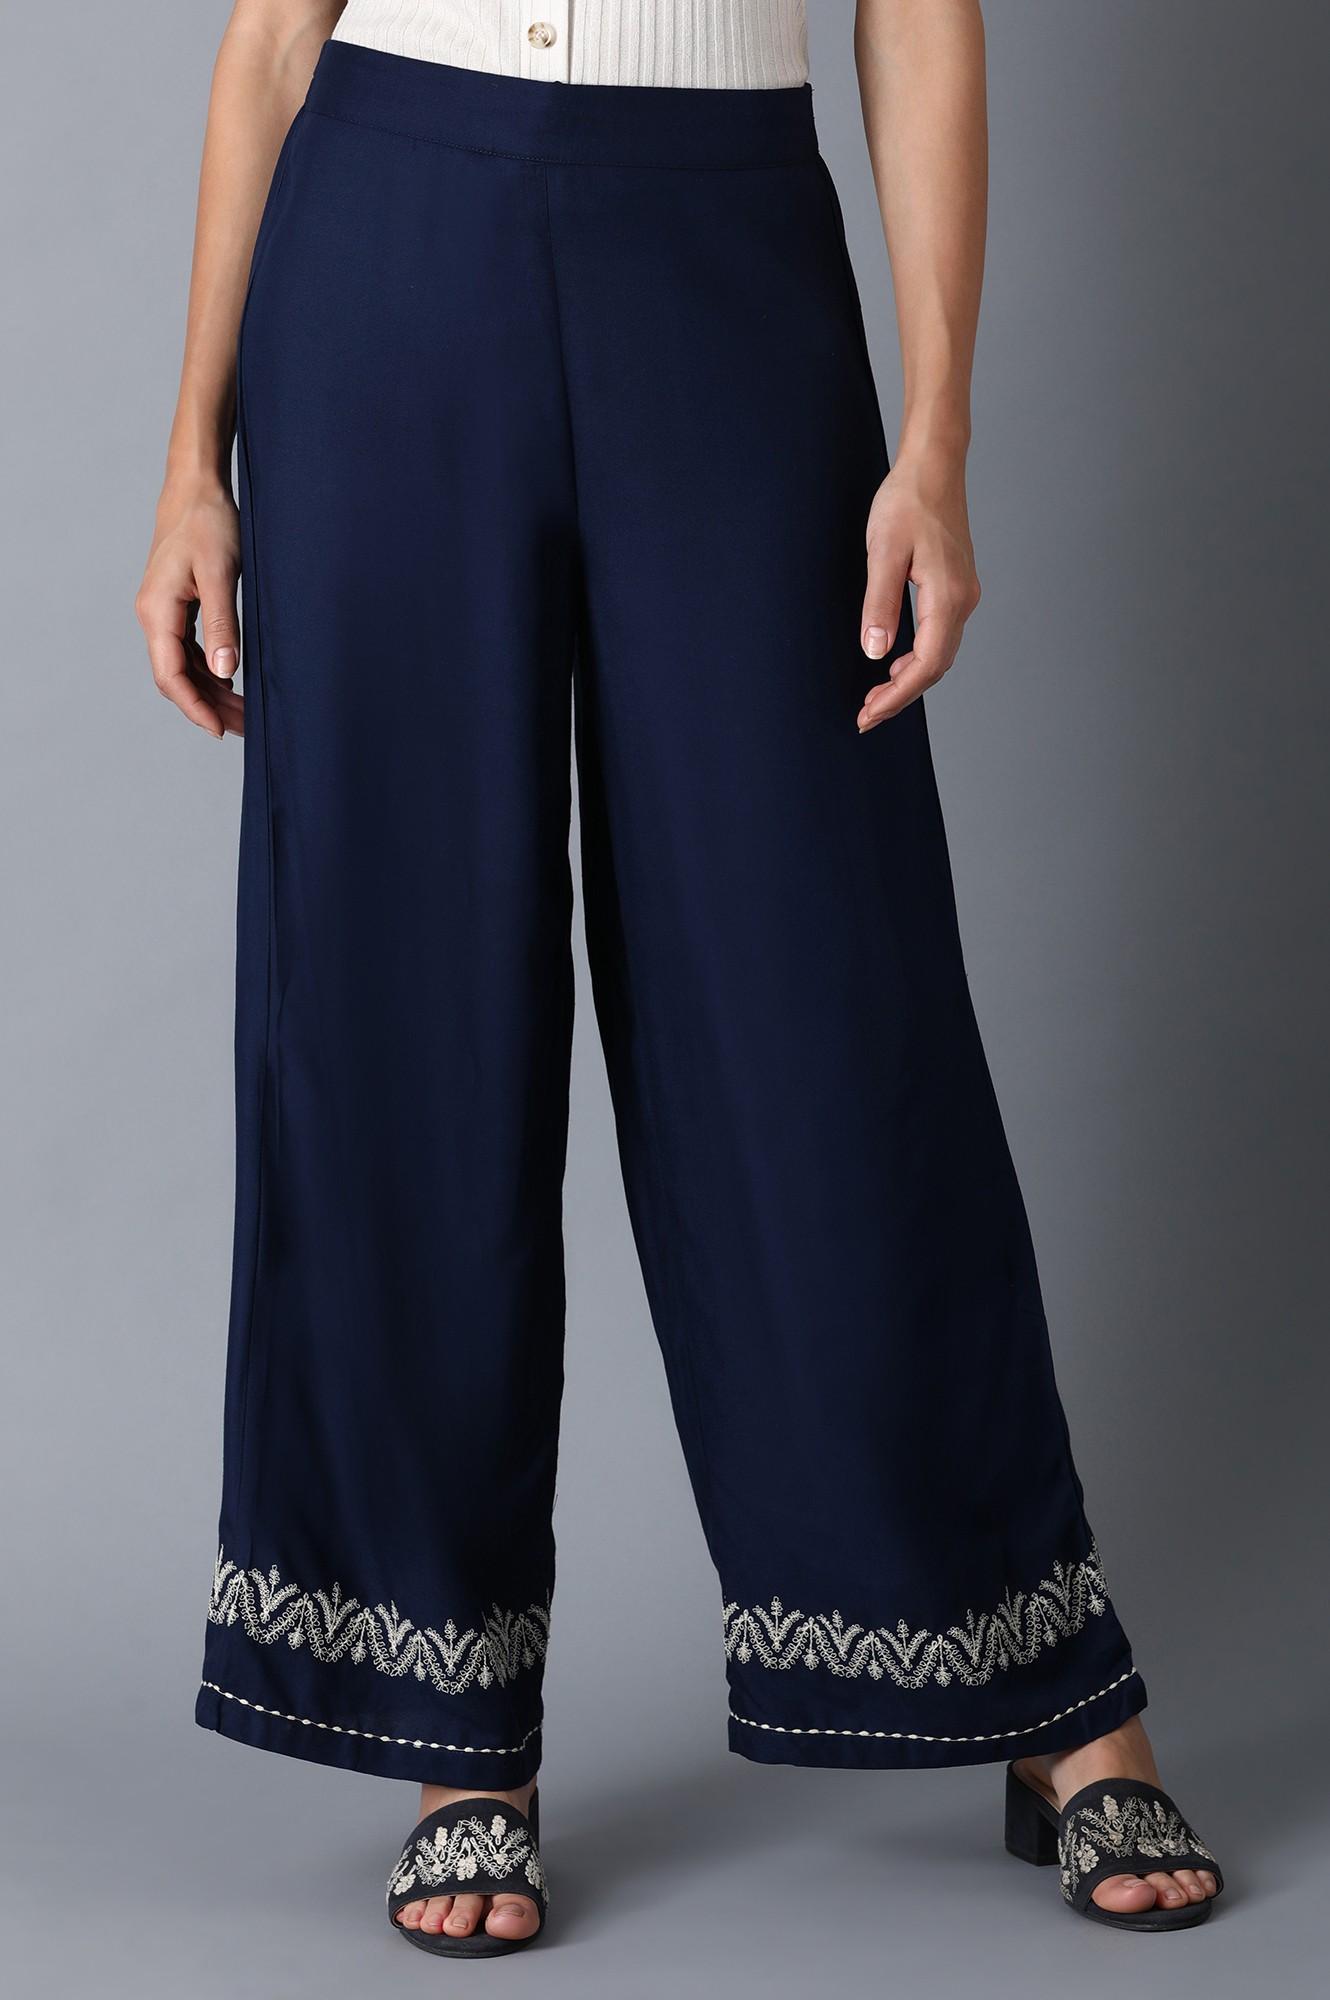 W | Navy Blue Parallel Pants